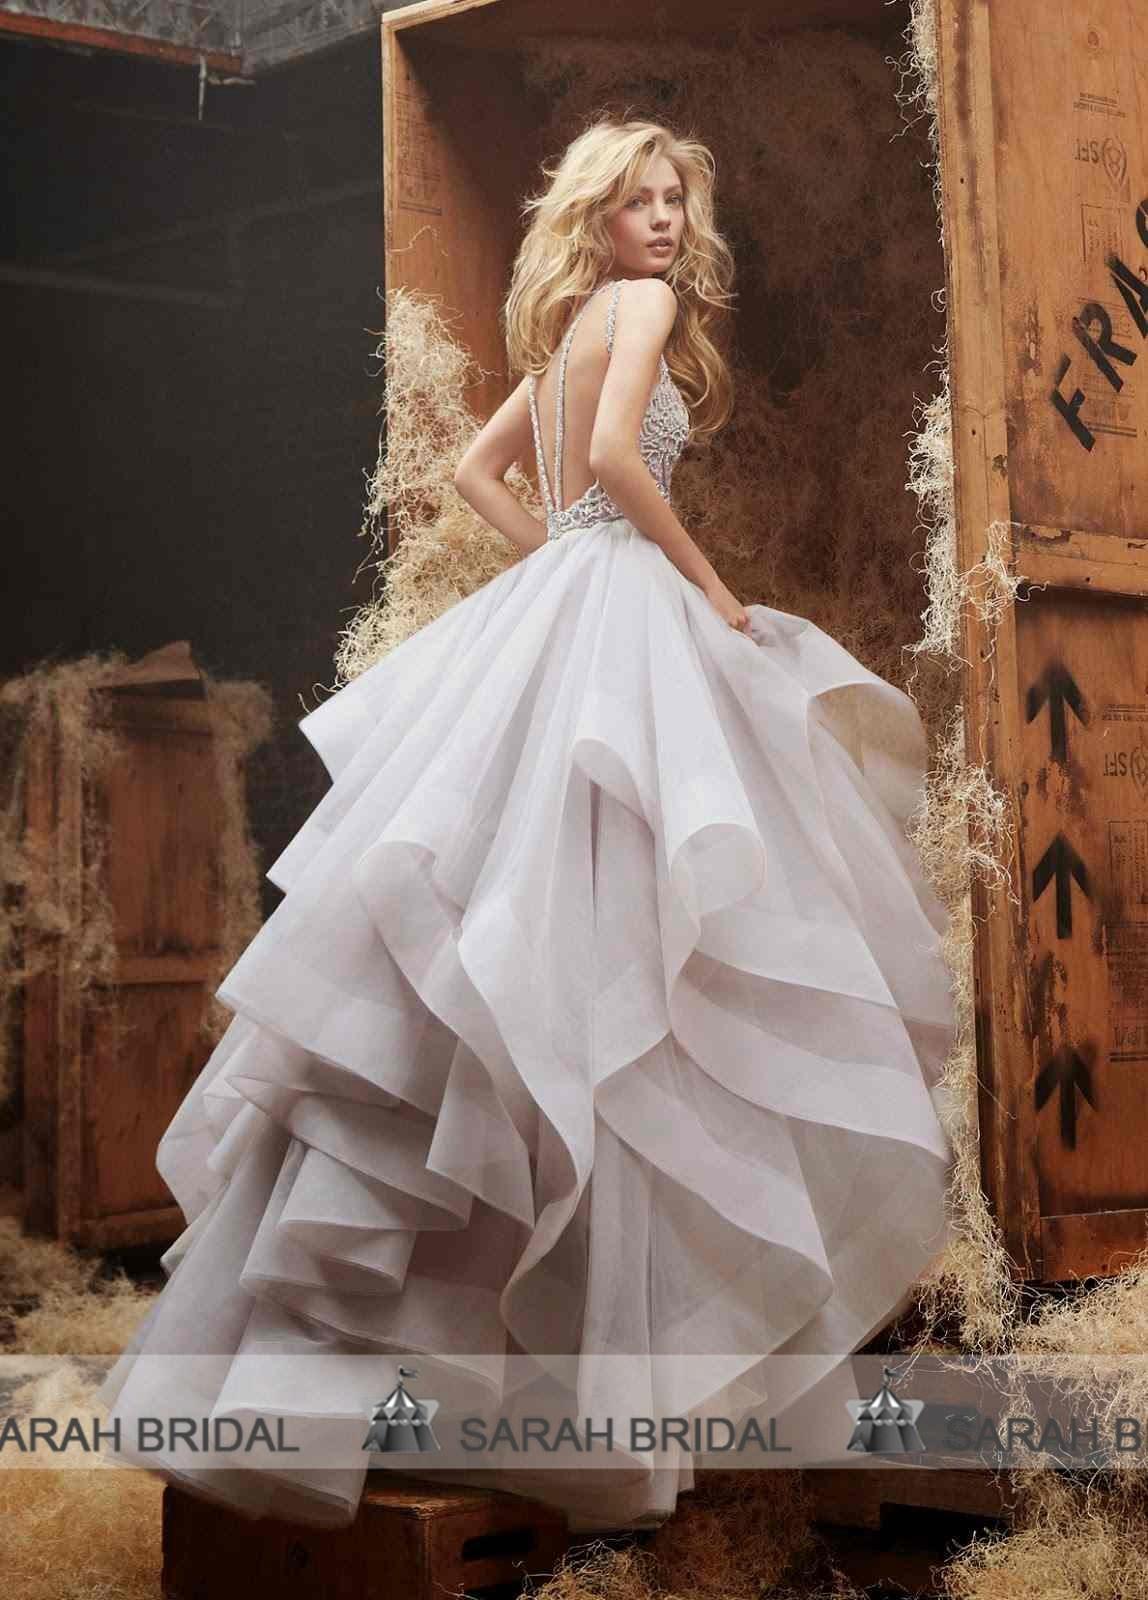 Buy sexy backless wedding dresses 2015 a line beads jewel neckline floor length bridal gown organza sleeveless bride dress custom made, $172.69